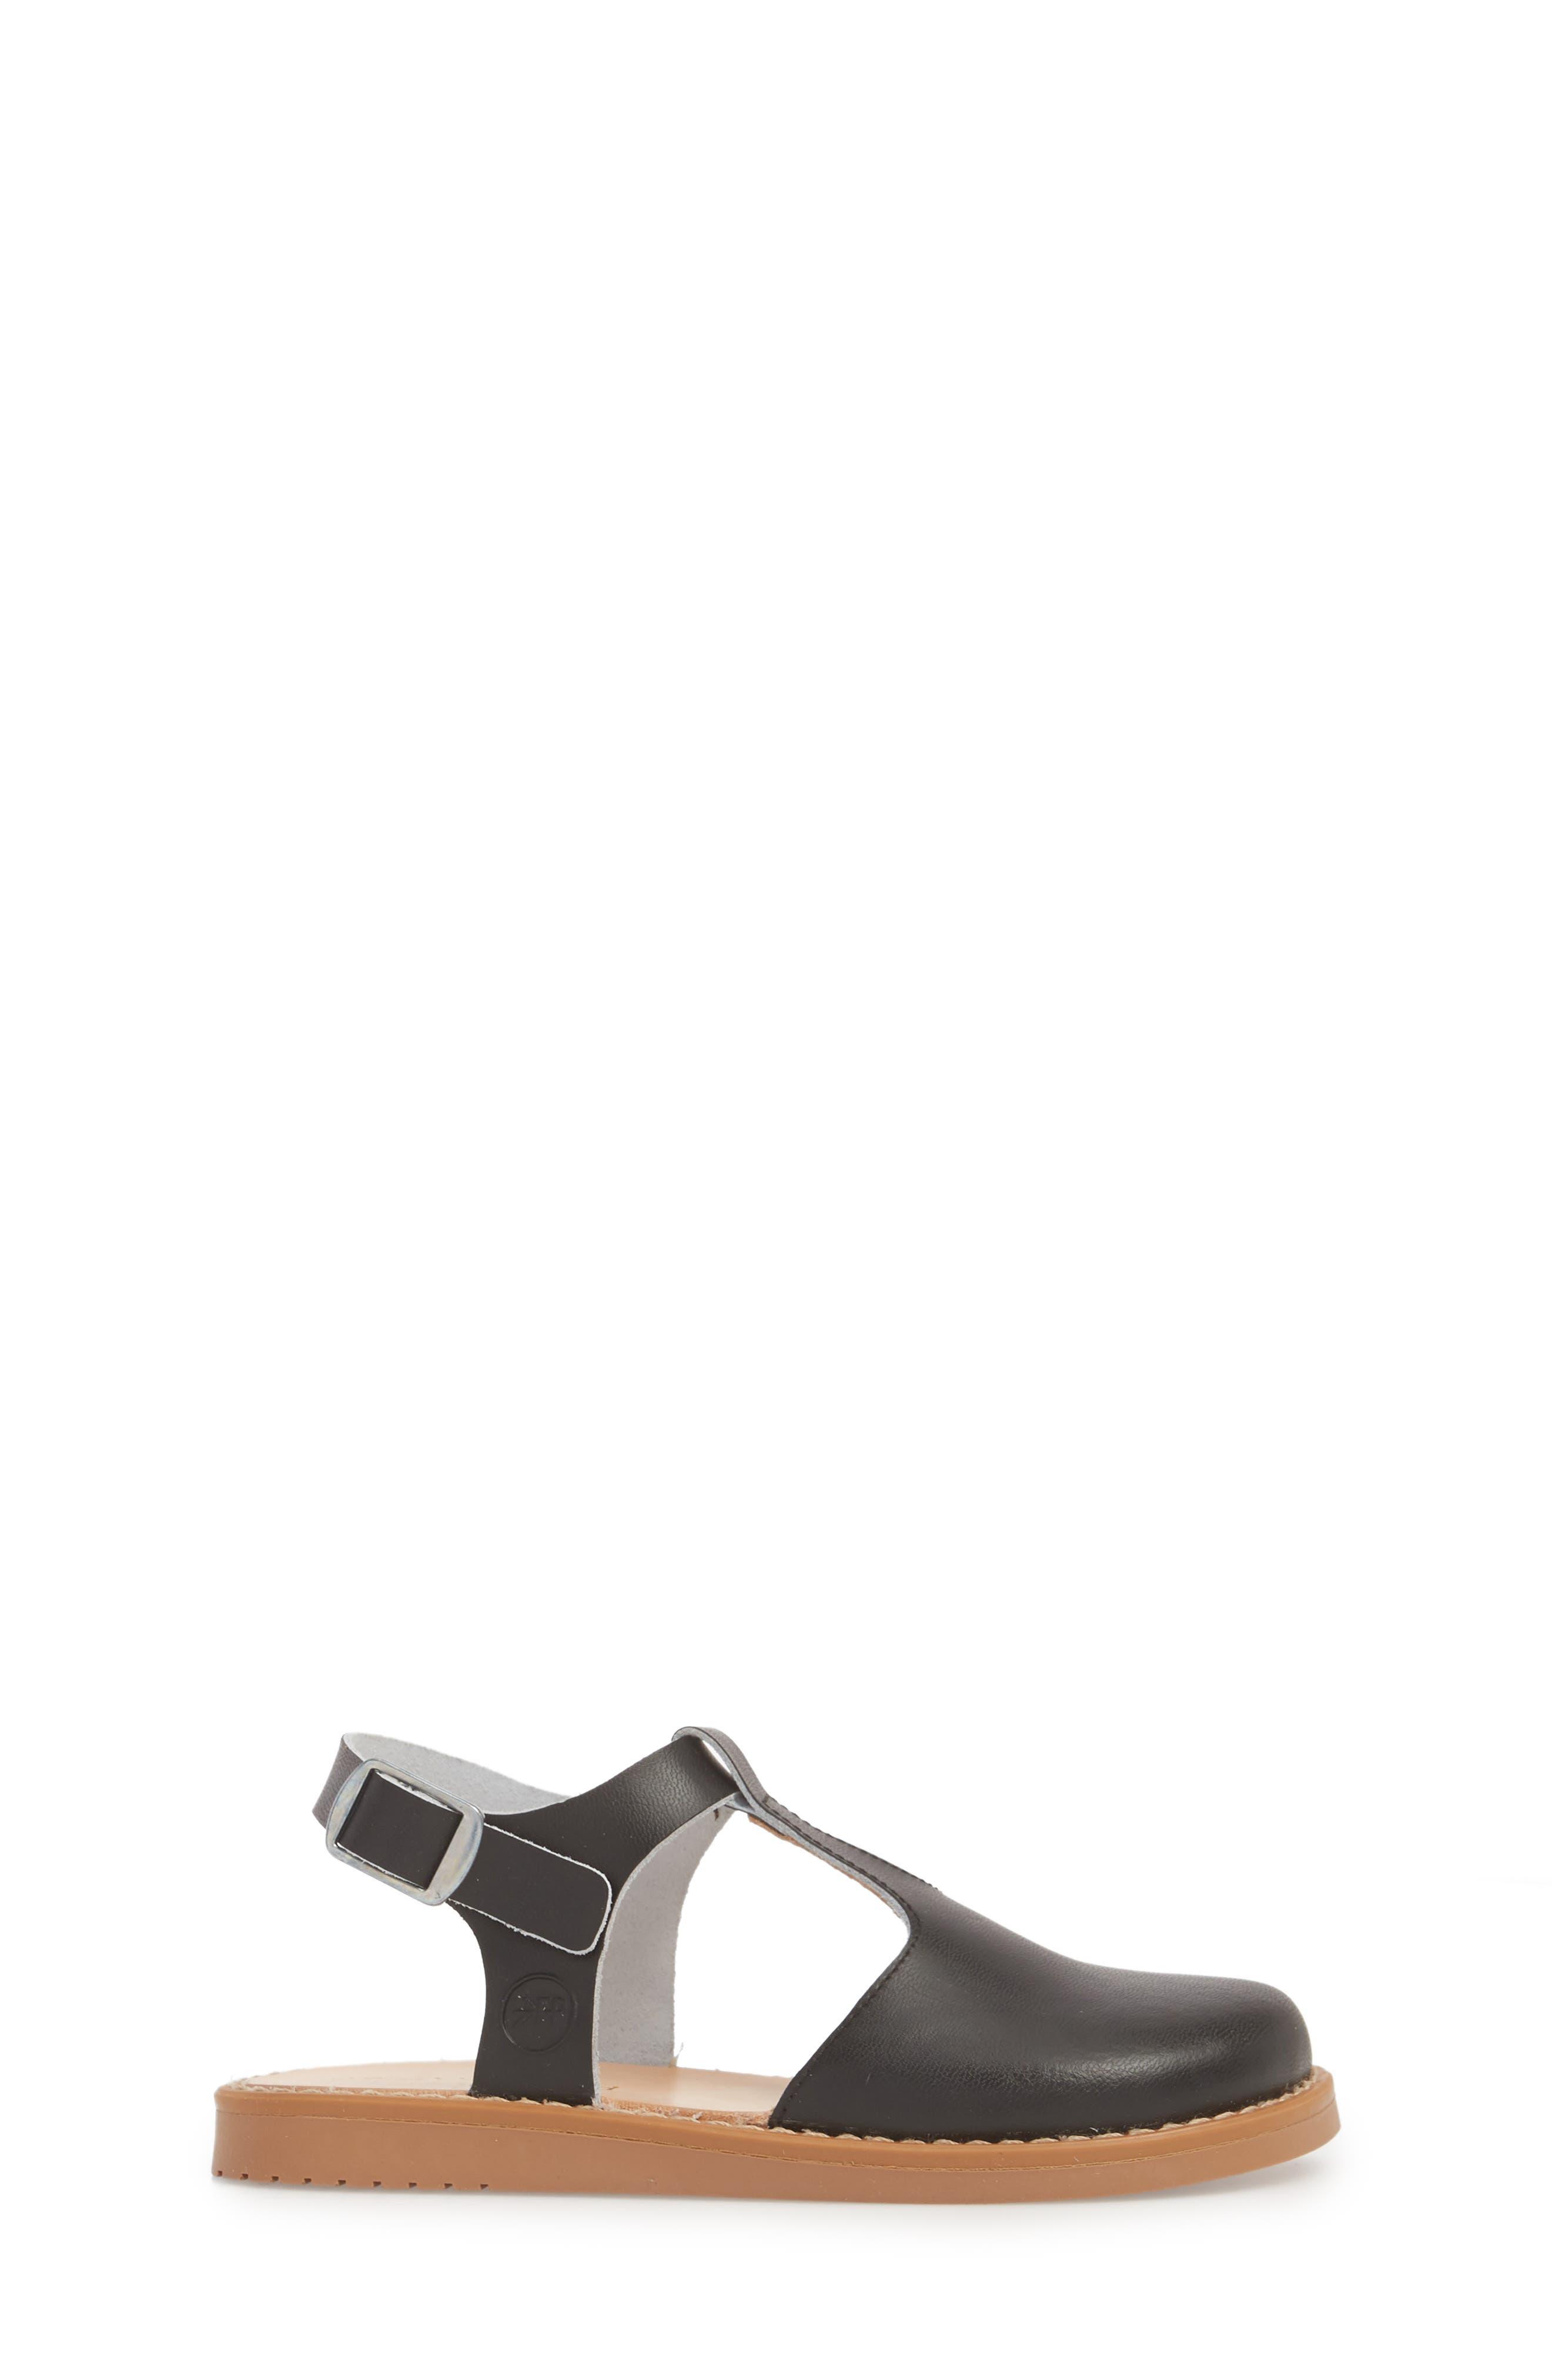 Newport Clog Sandal,                             Alternate thumbnail 3, color,                             BLACK